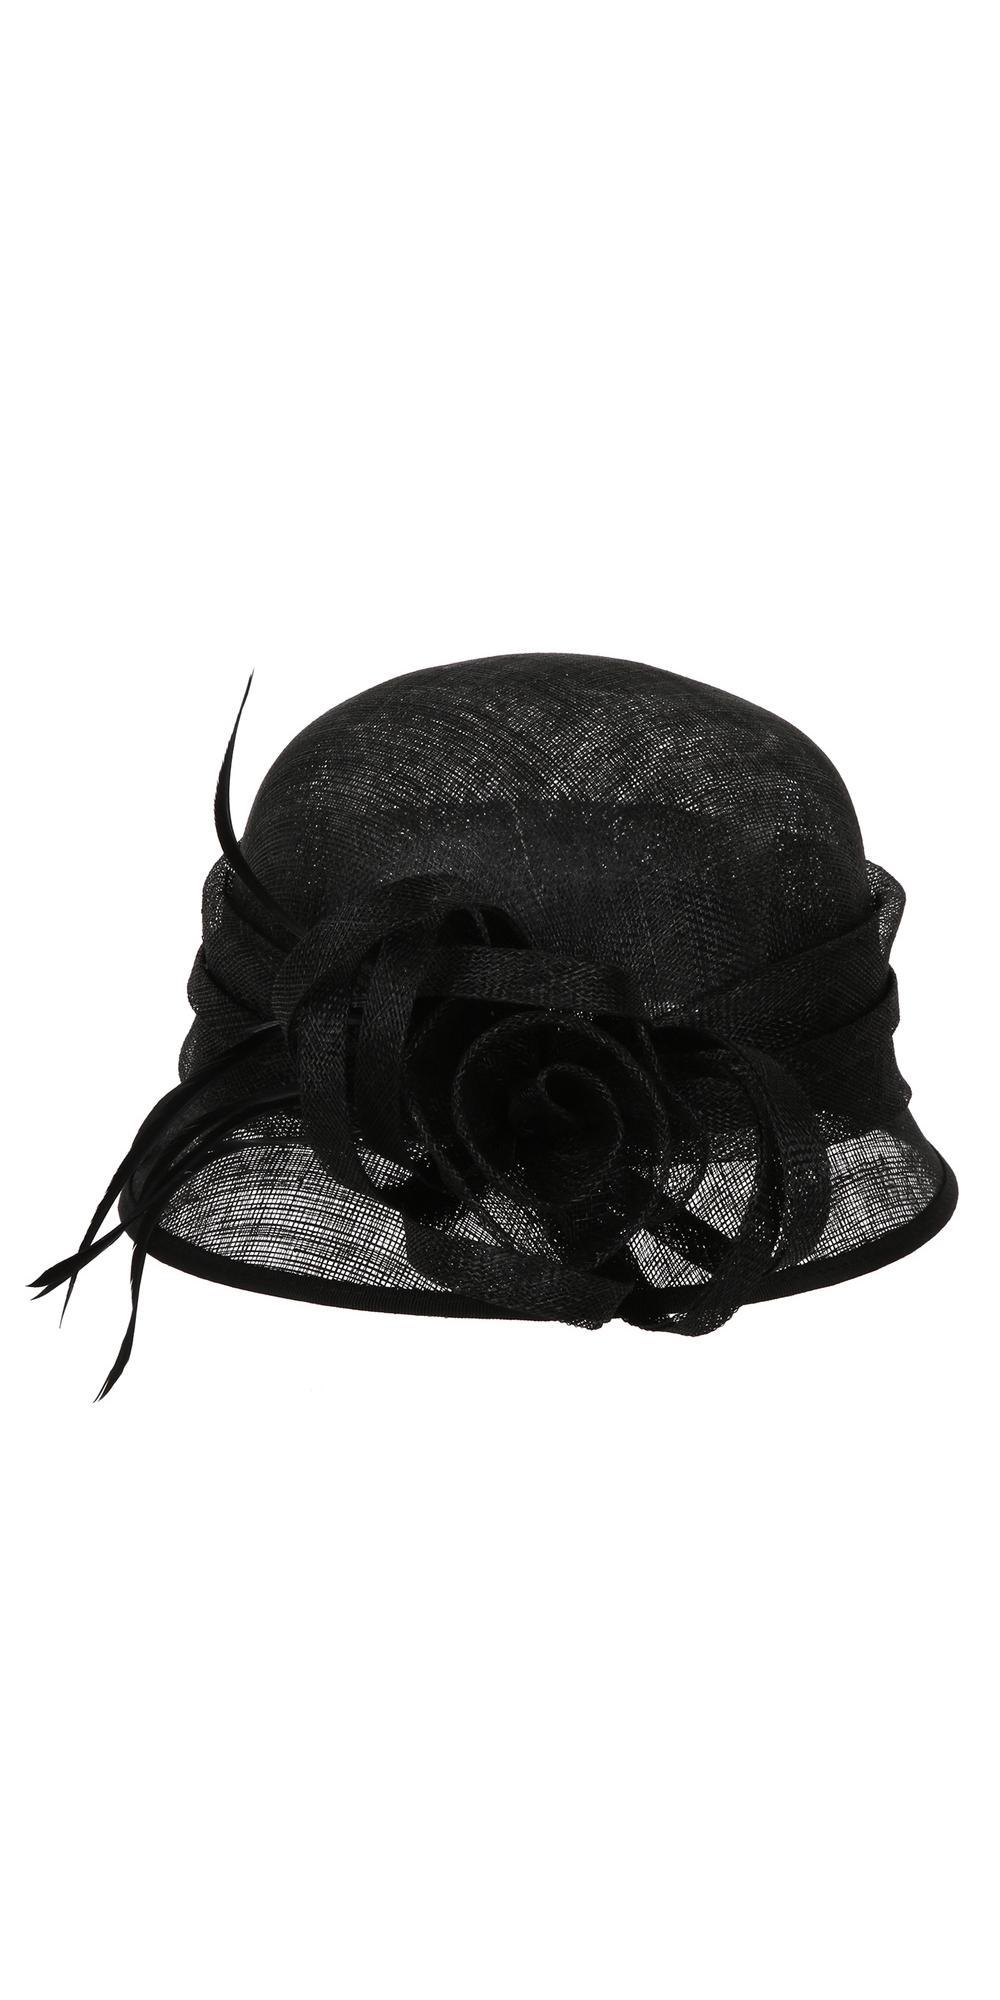 35862097 1920s Style Sinamay Bucket Hat in Black